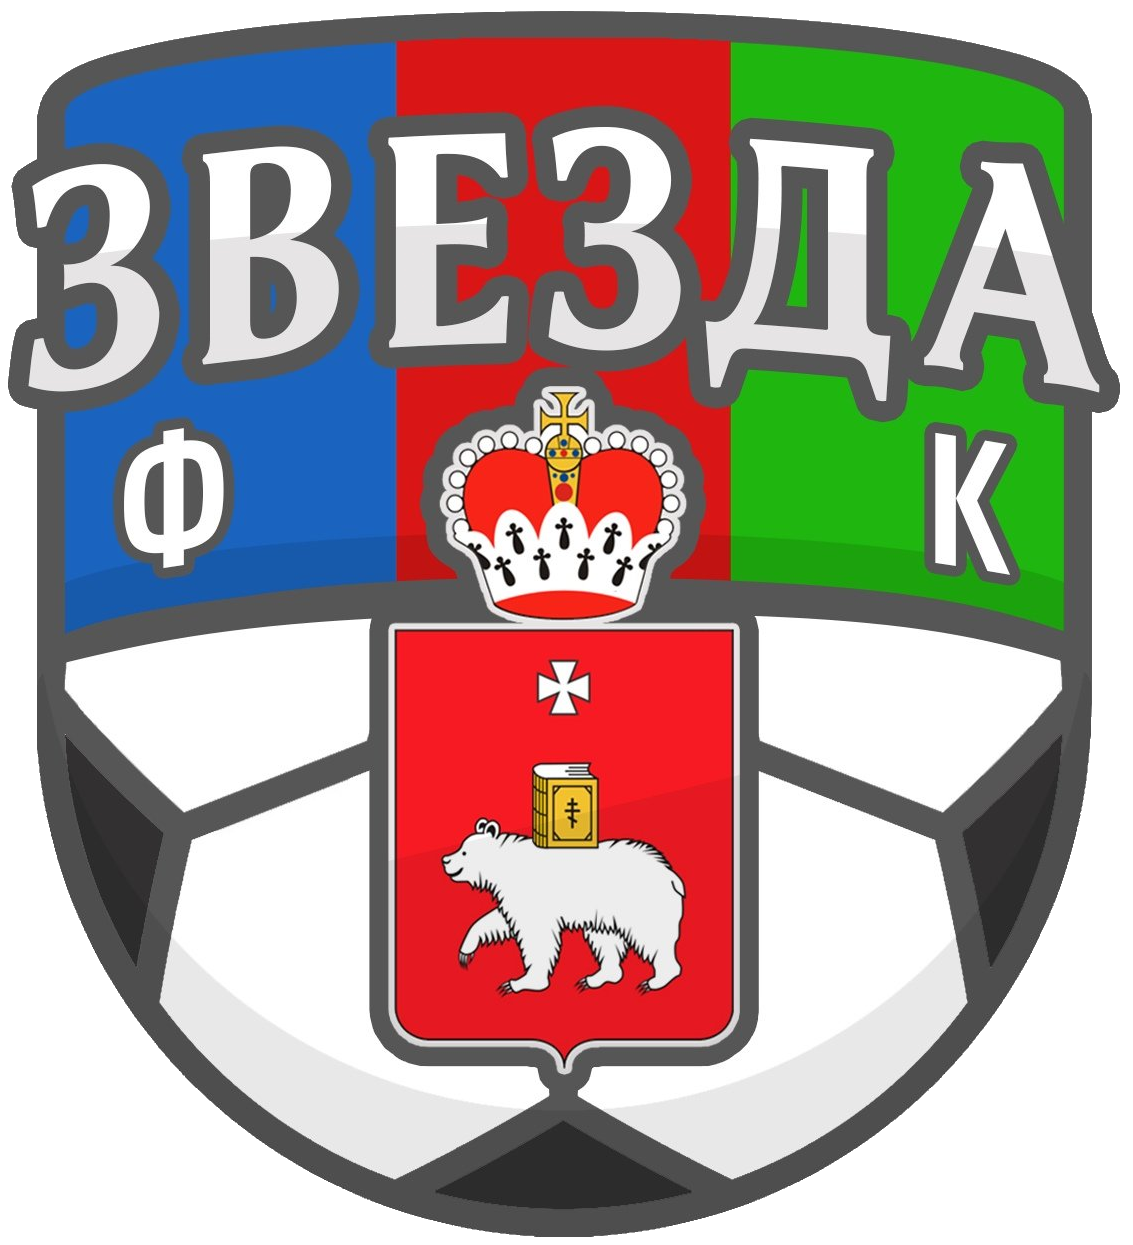 Zvezda Perm team logo